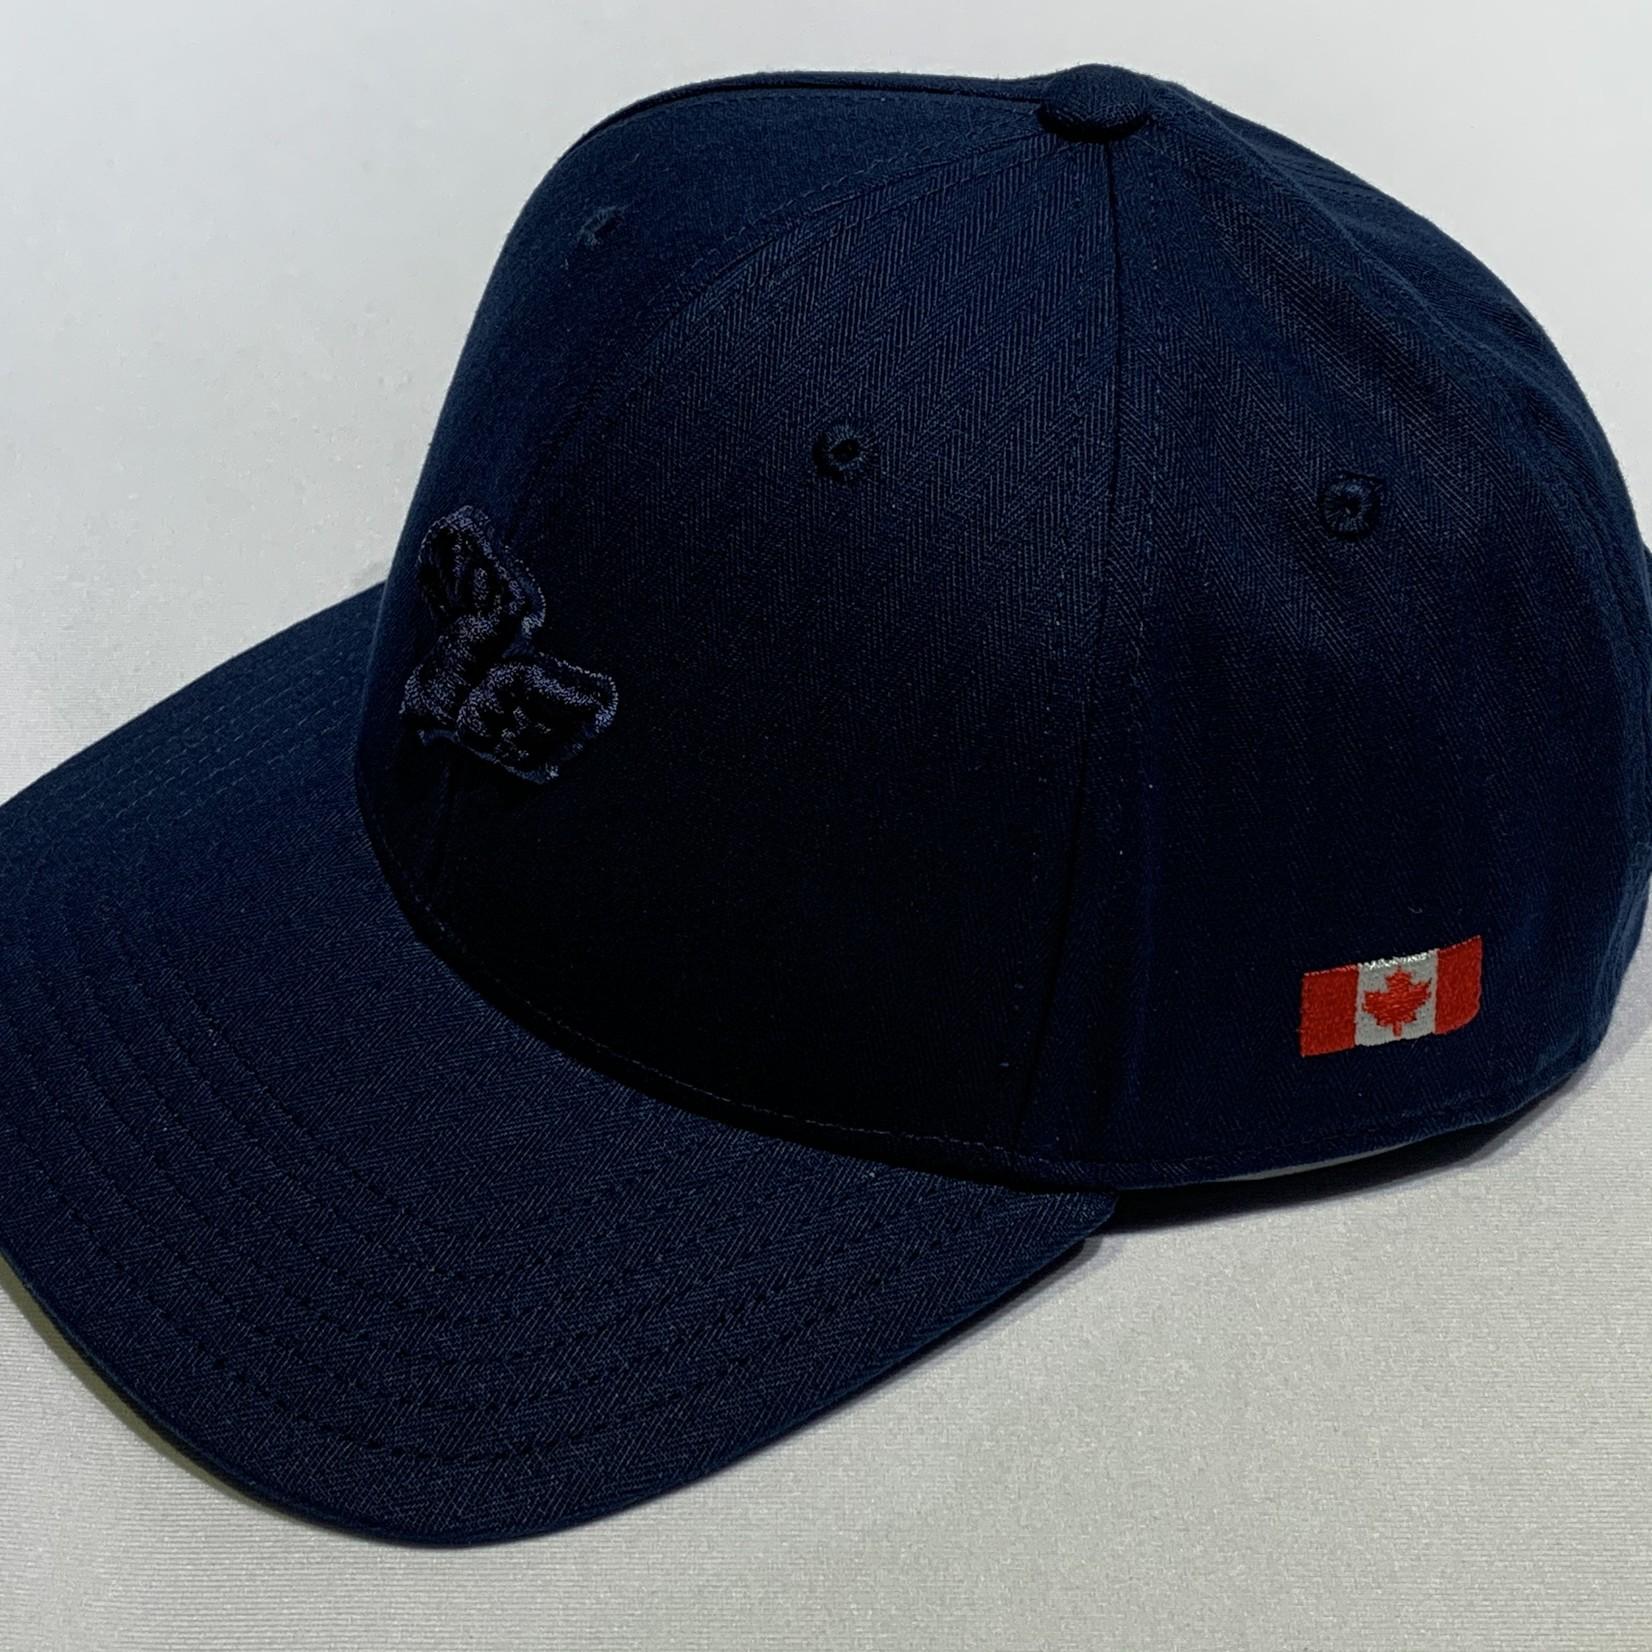 Prodigy Denver Hat - Logo